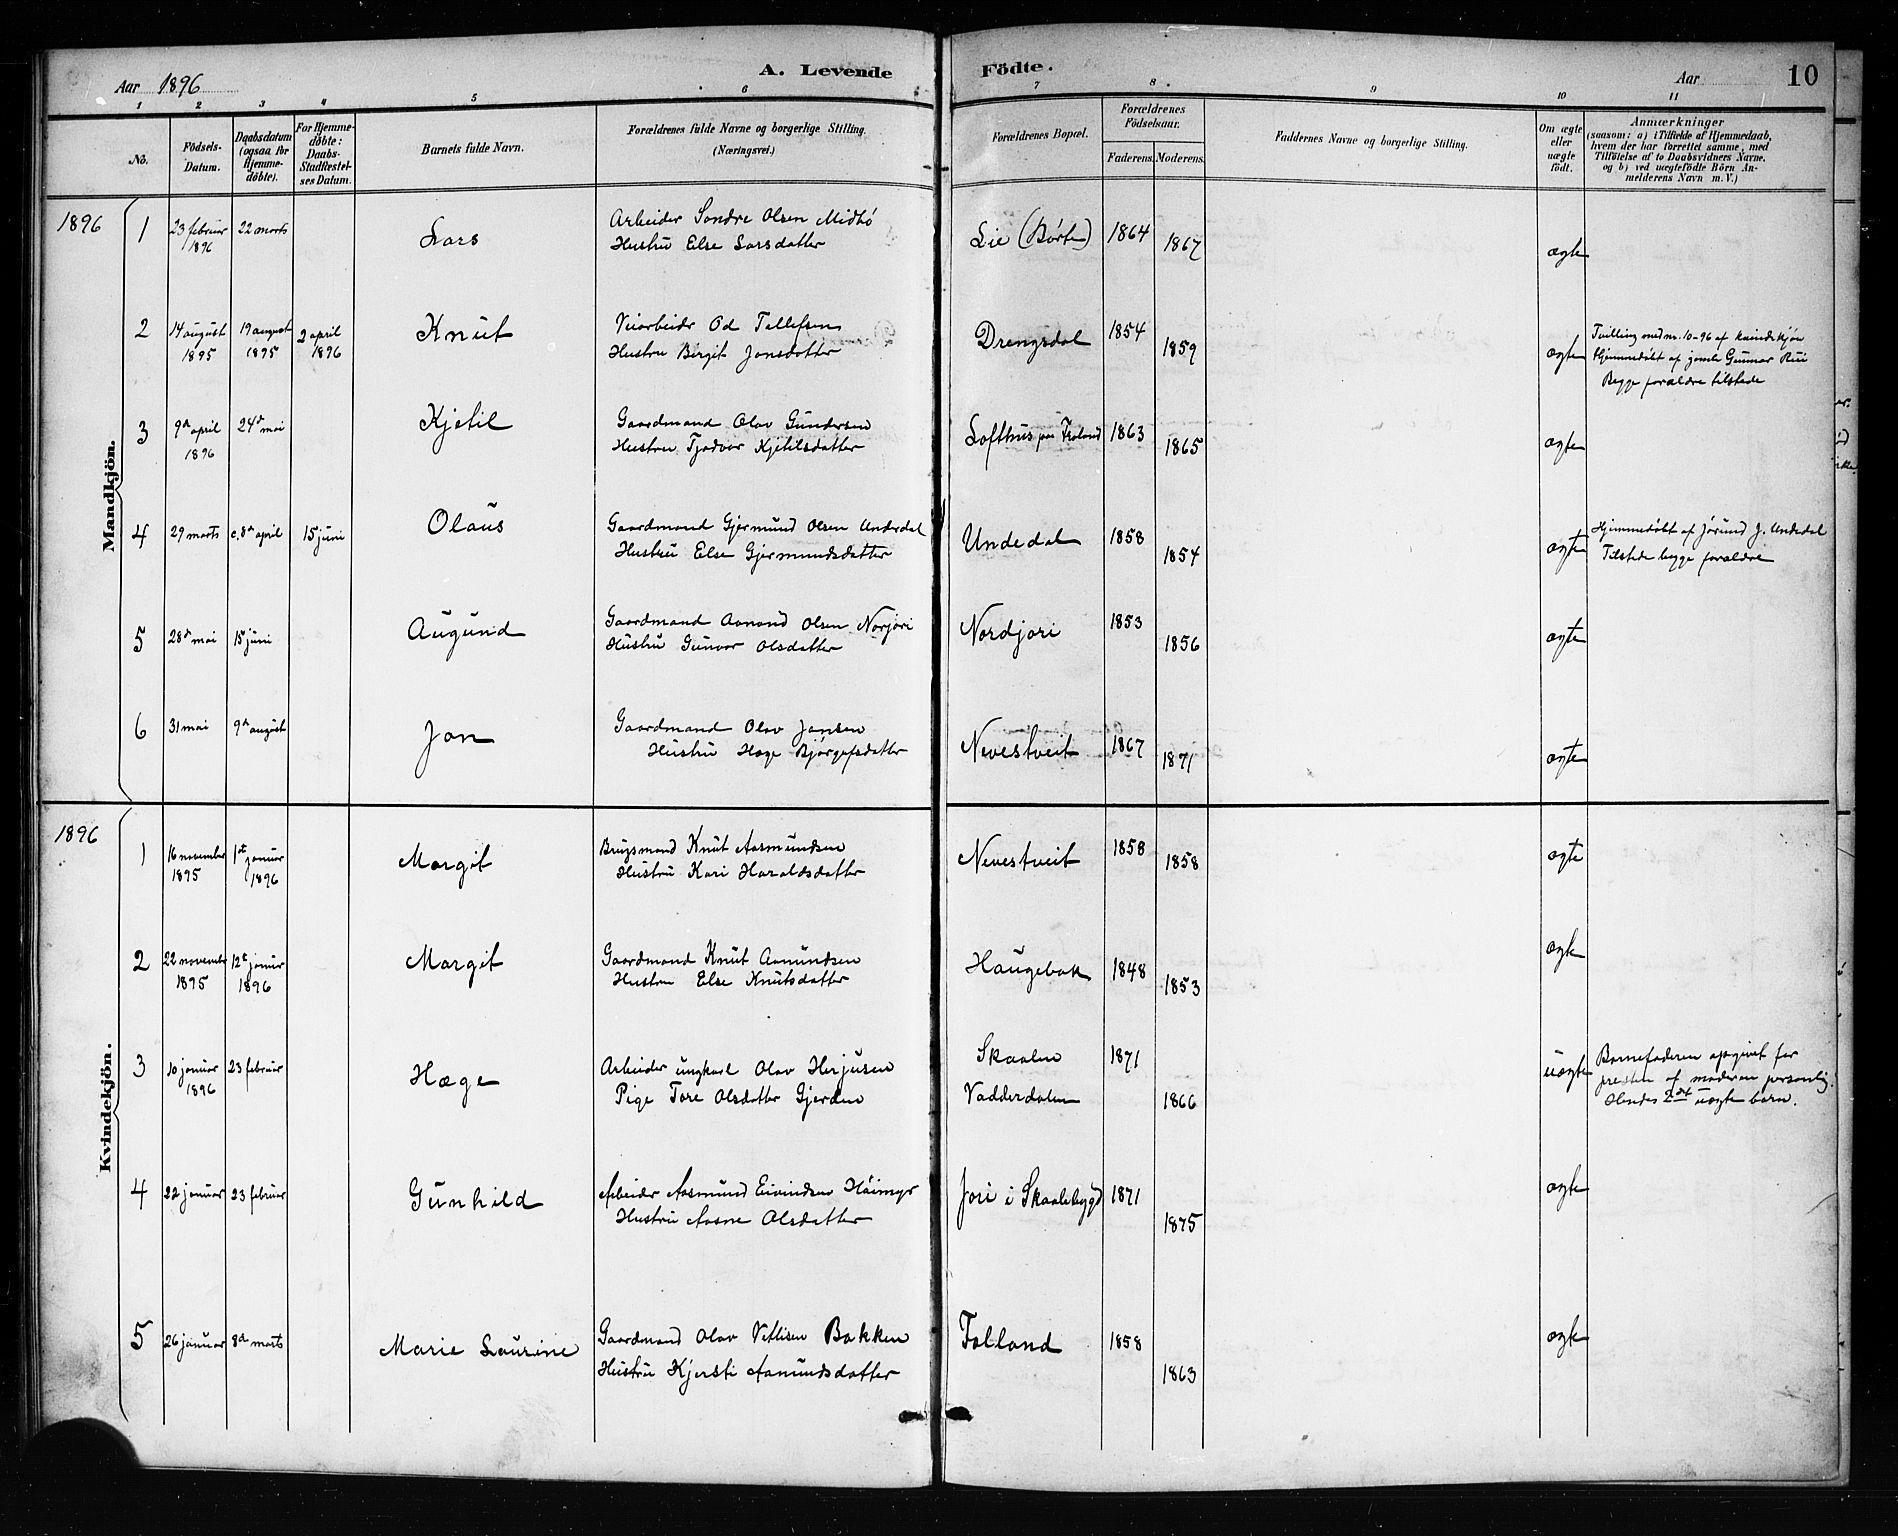 SAKO, Mo kirkebøker, G/Ga/L0002: Klokkerbok nr. I 2, 1892-1914, s. 10